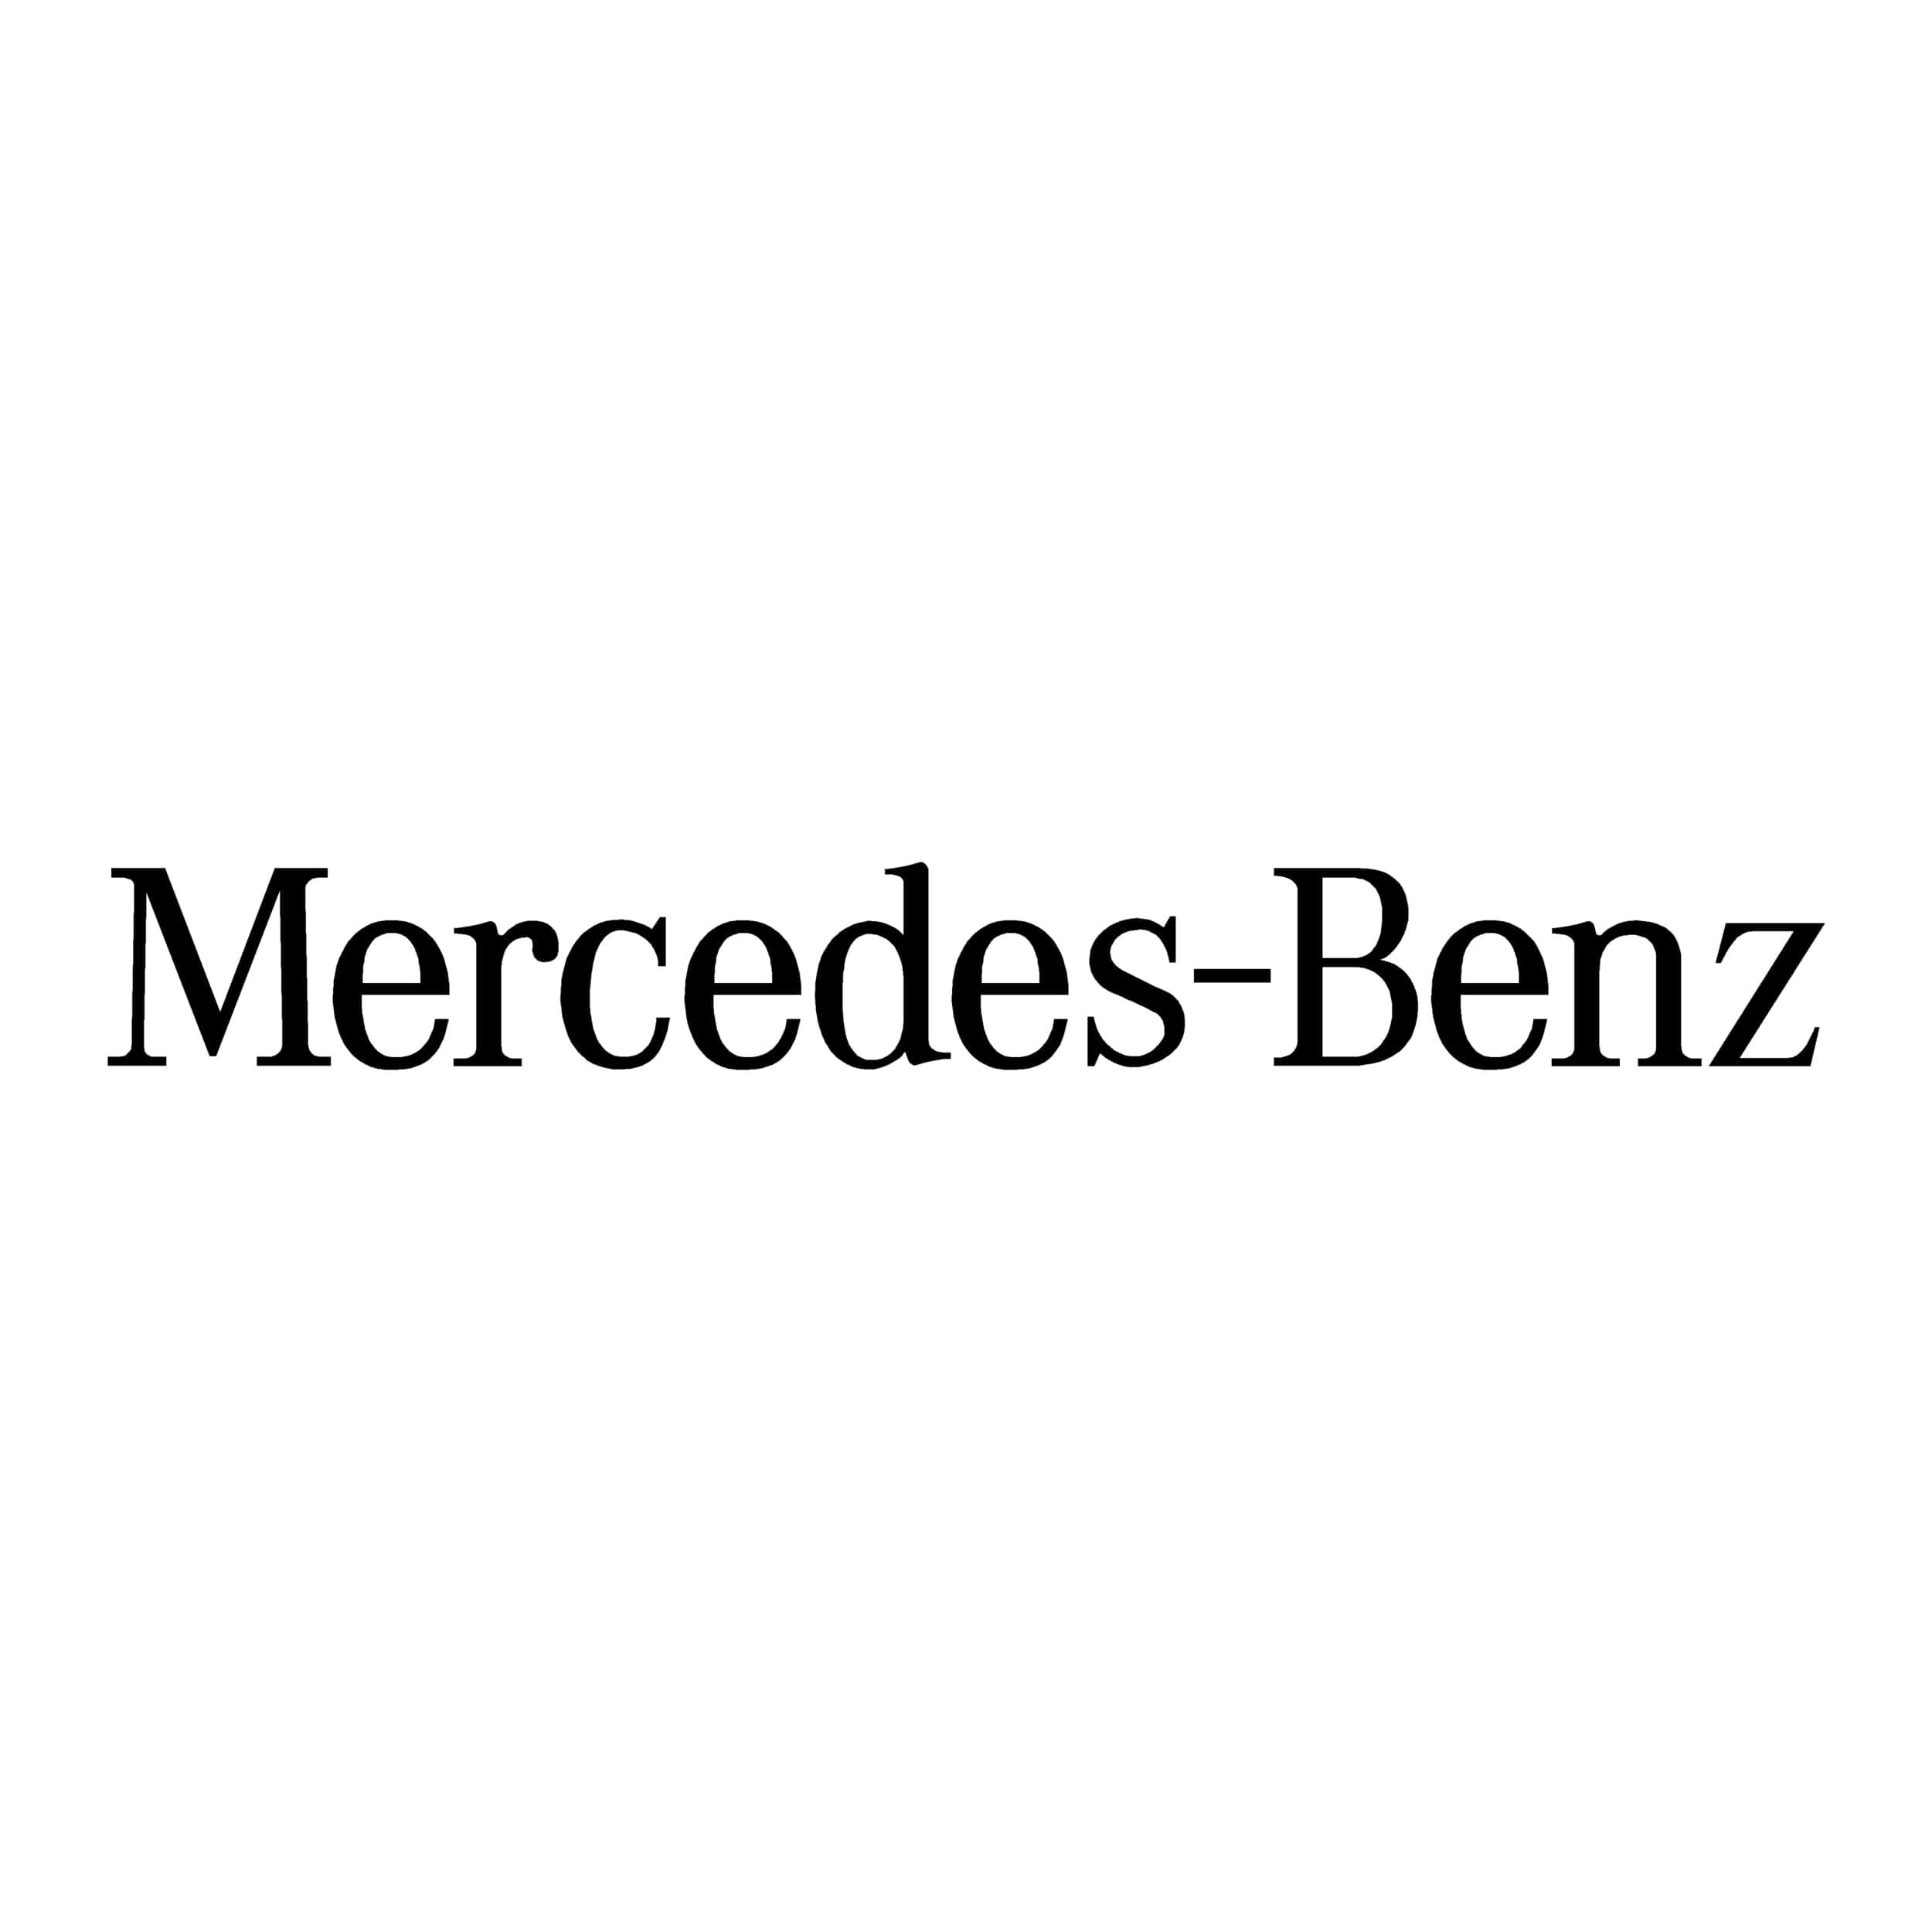 stickers-mercedes-benz-ref-2-auto-tuning-amortisseur-4x4-tout-terrain-auto-camion-competition-rallye-autocollant-min